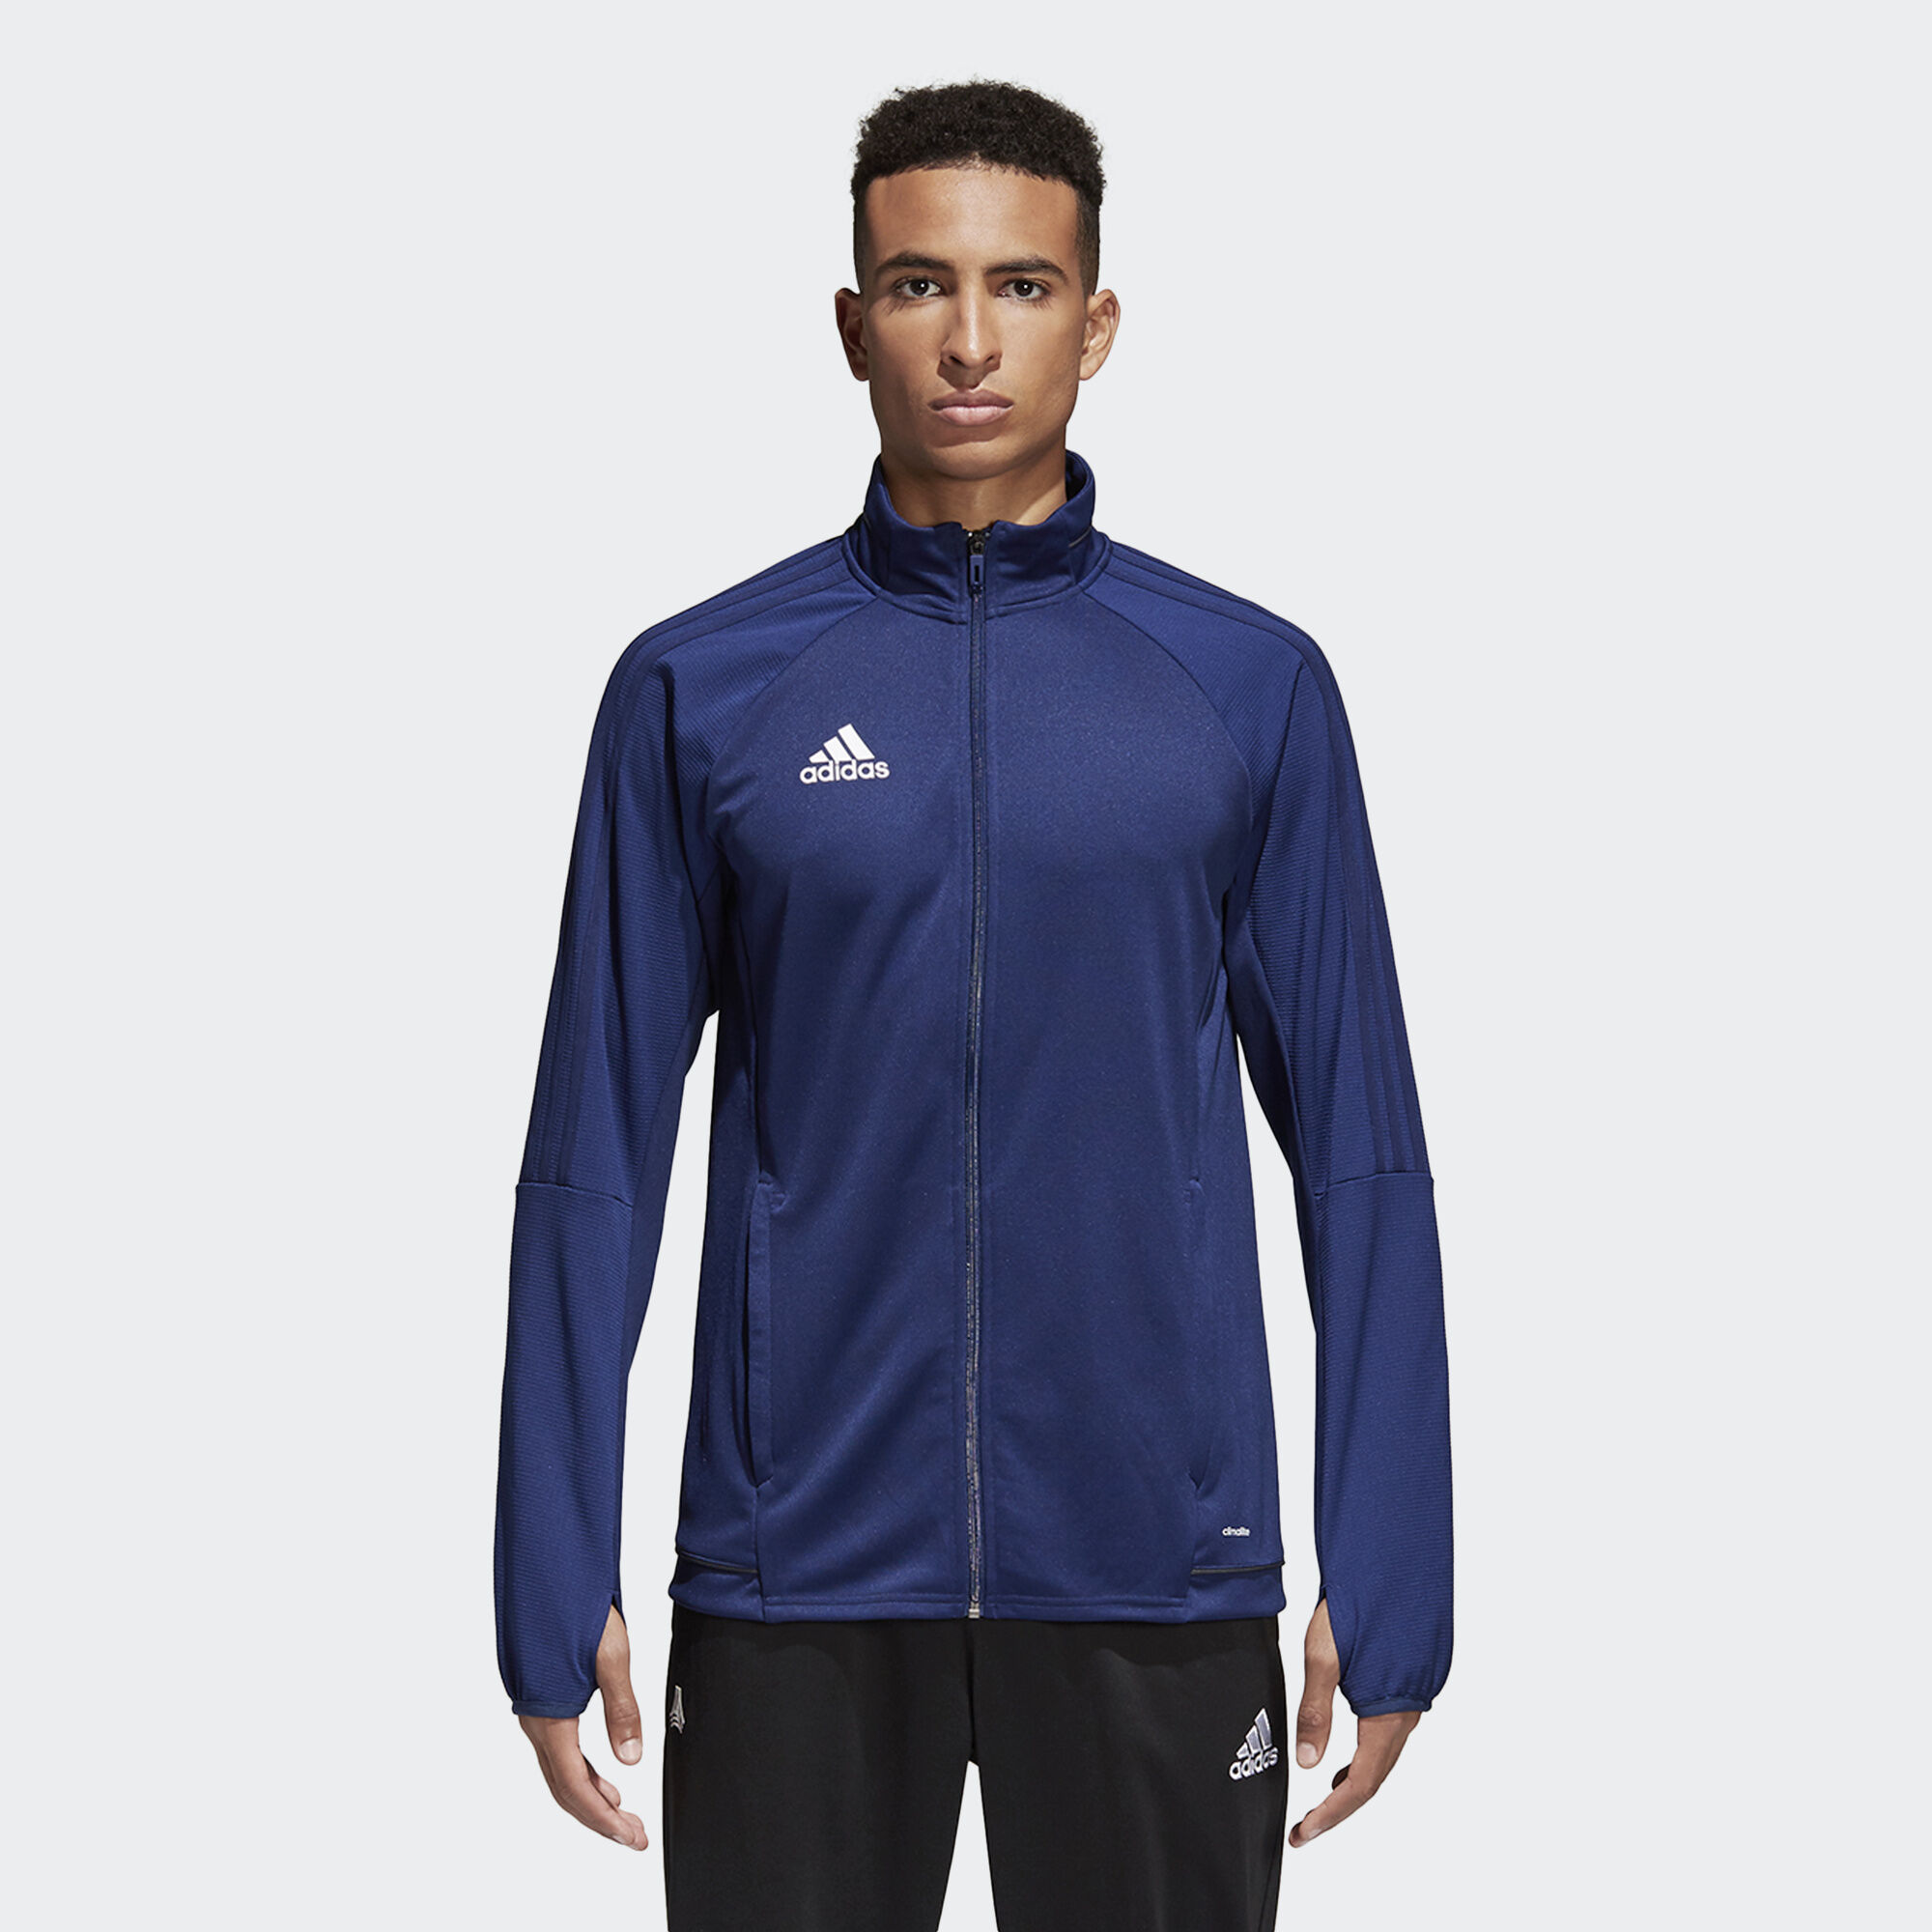 Adidas jacket - Adidas Tiro 17 Training Jacket Blue Dark Shale White Bq8199